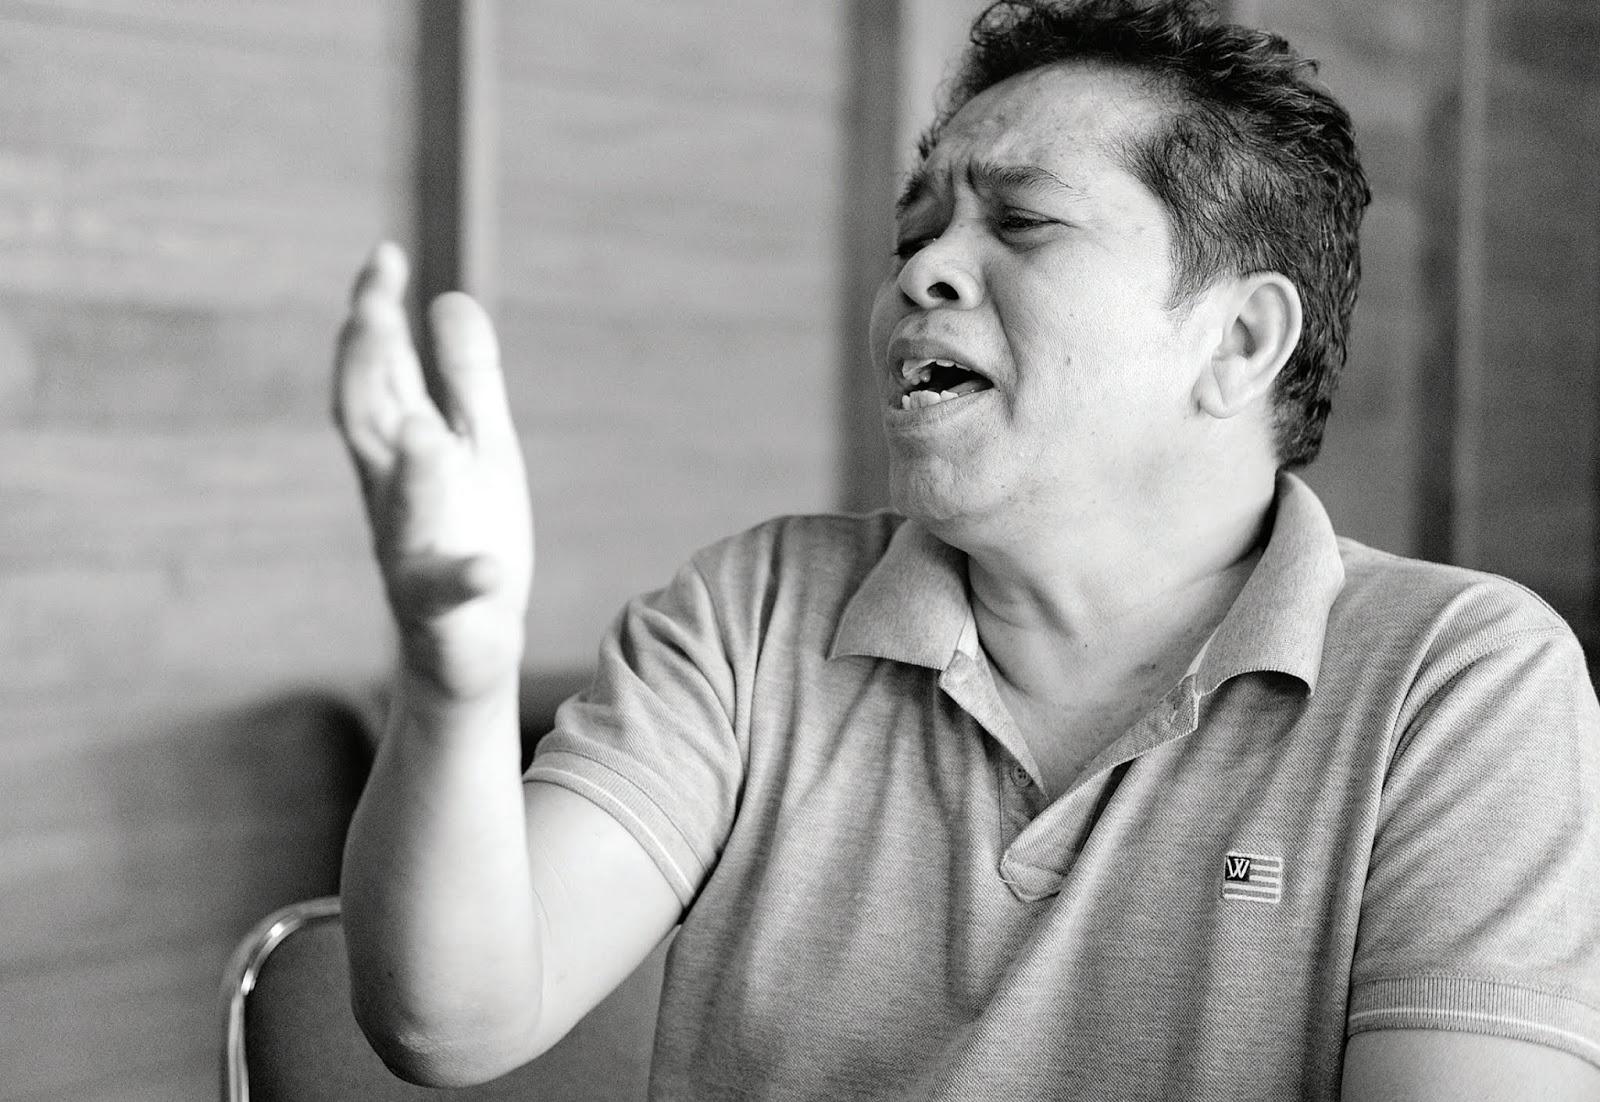 foto artis Tagor Tampubolon pencipta lagu Batak Toba